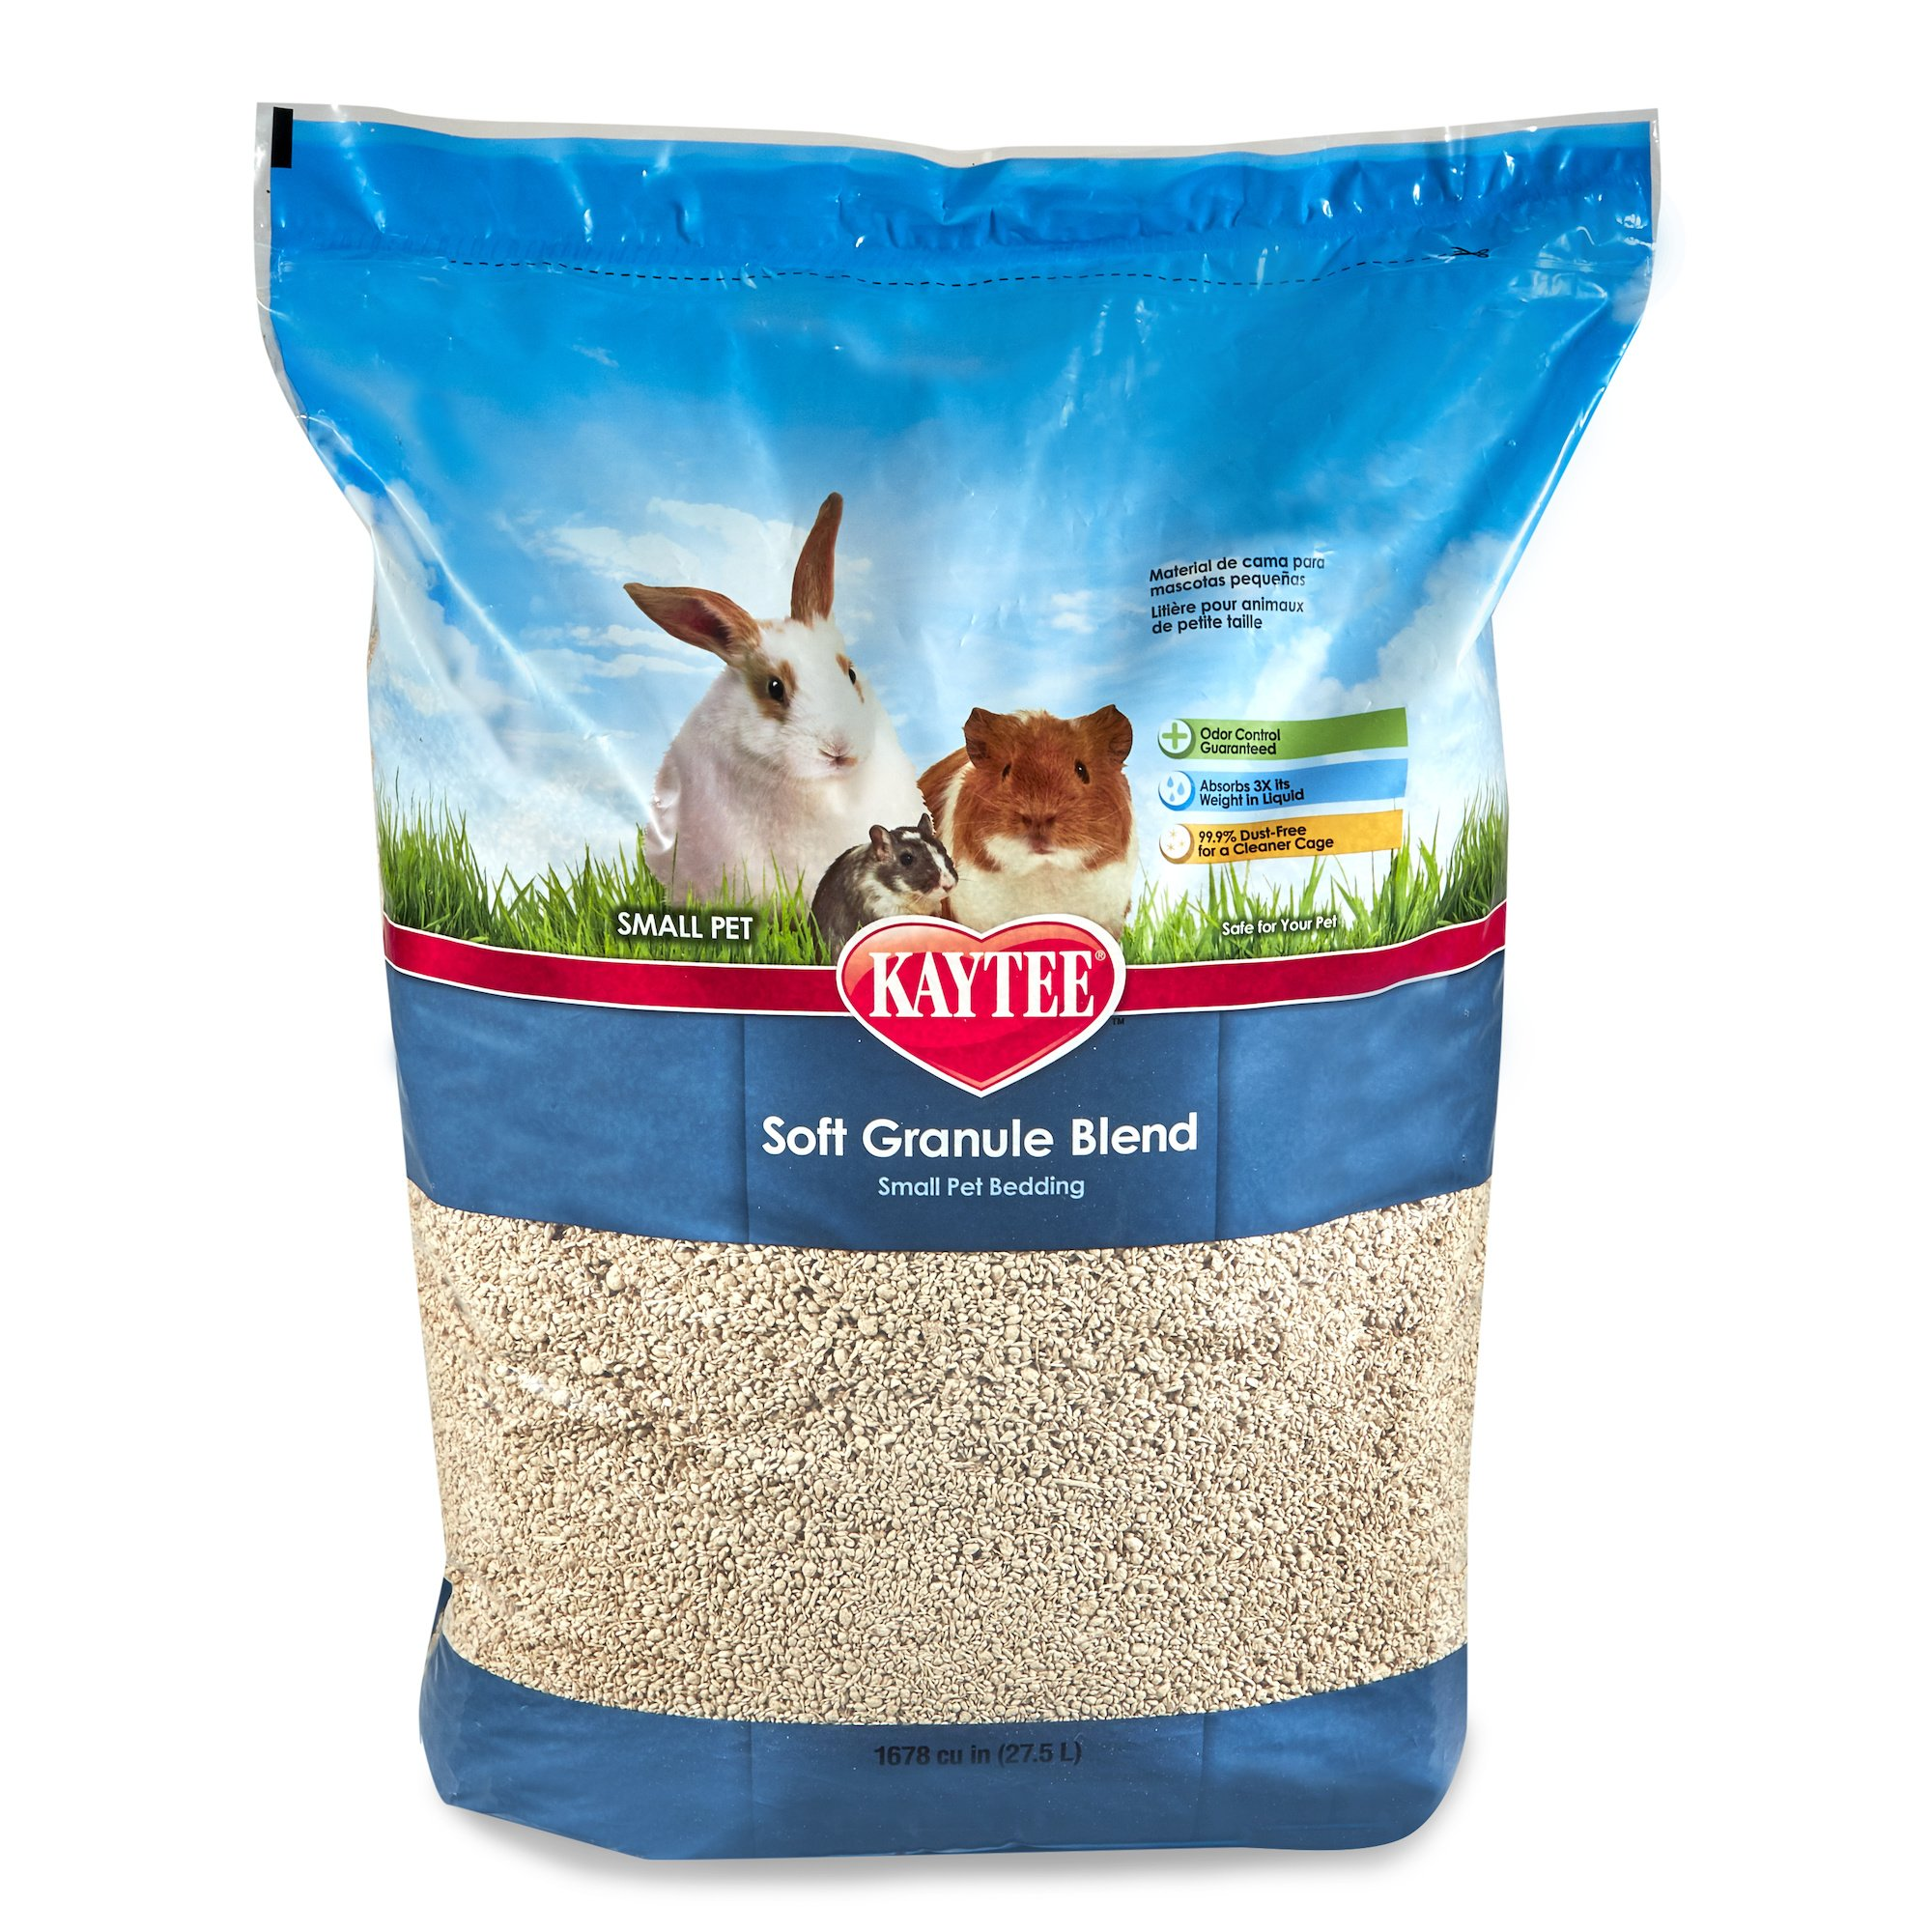 Kaytee Soft Granule Blend Bedding, 27.5 Liter